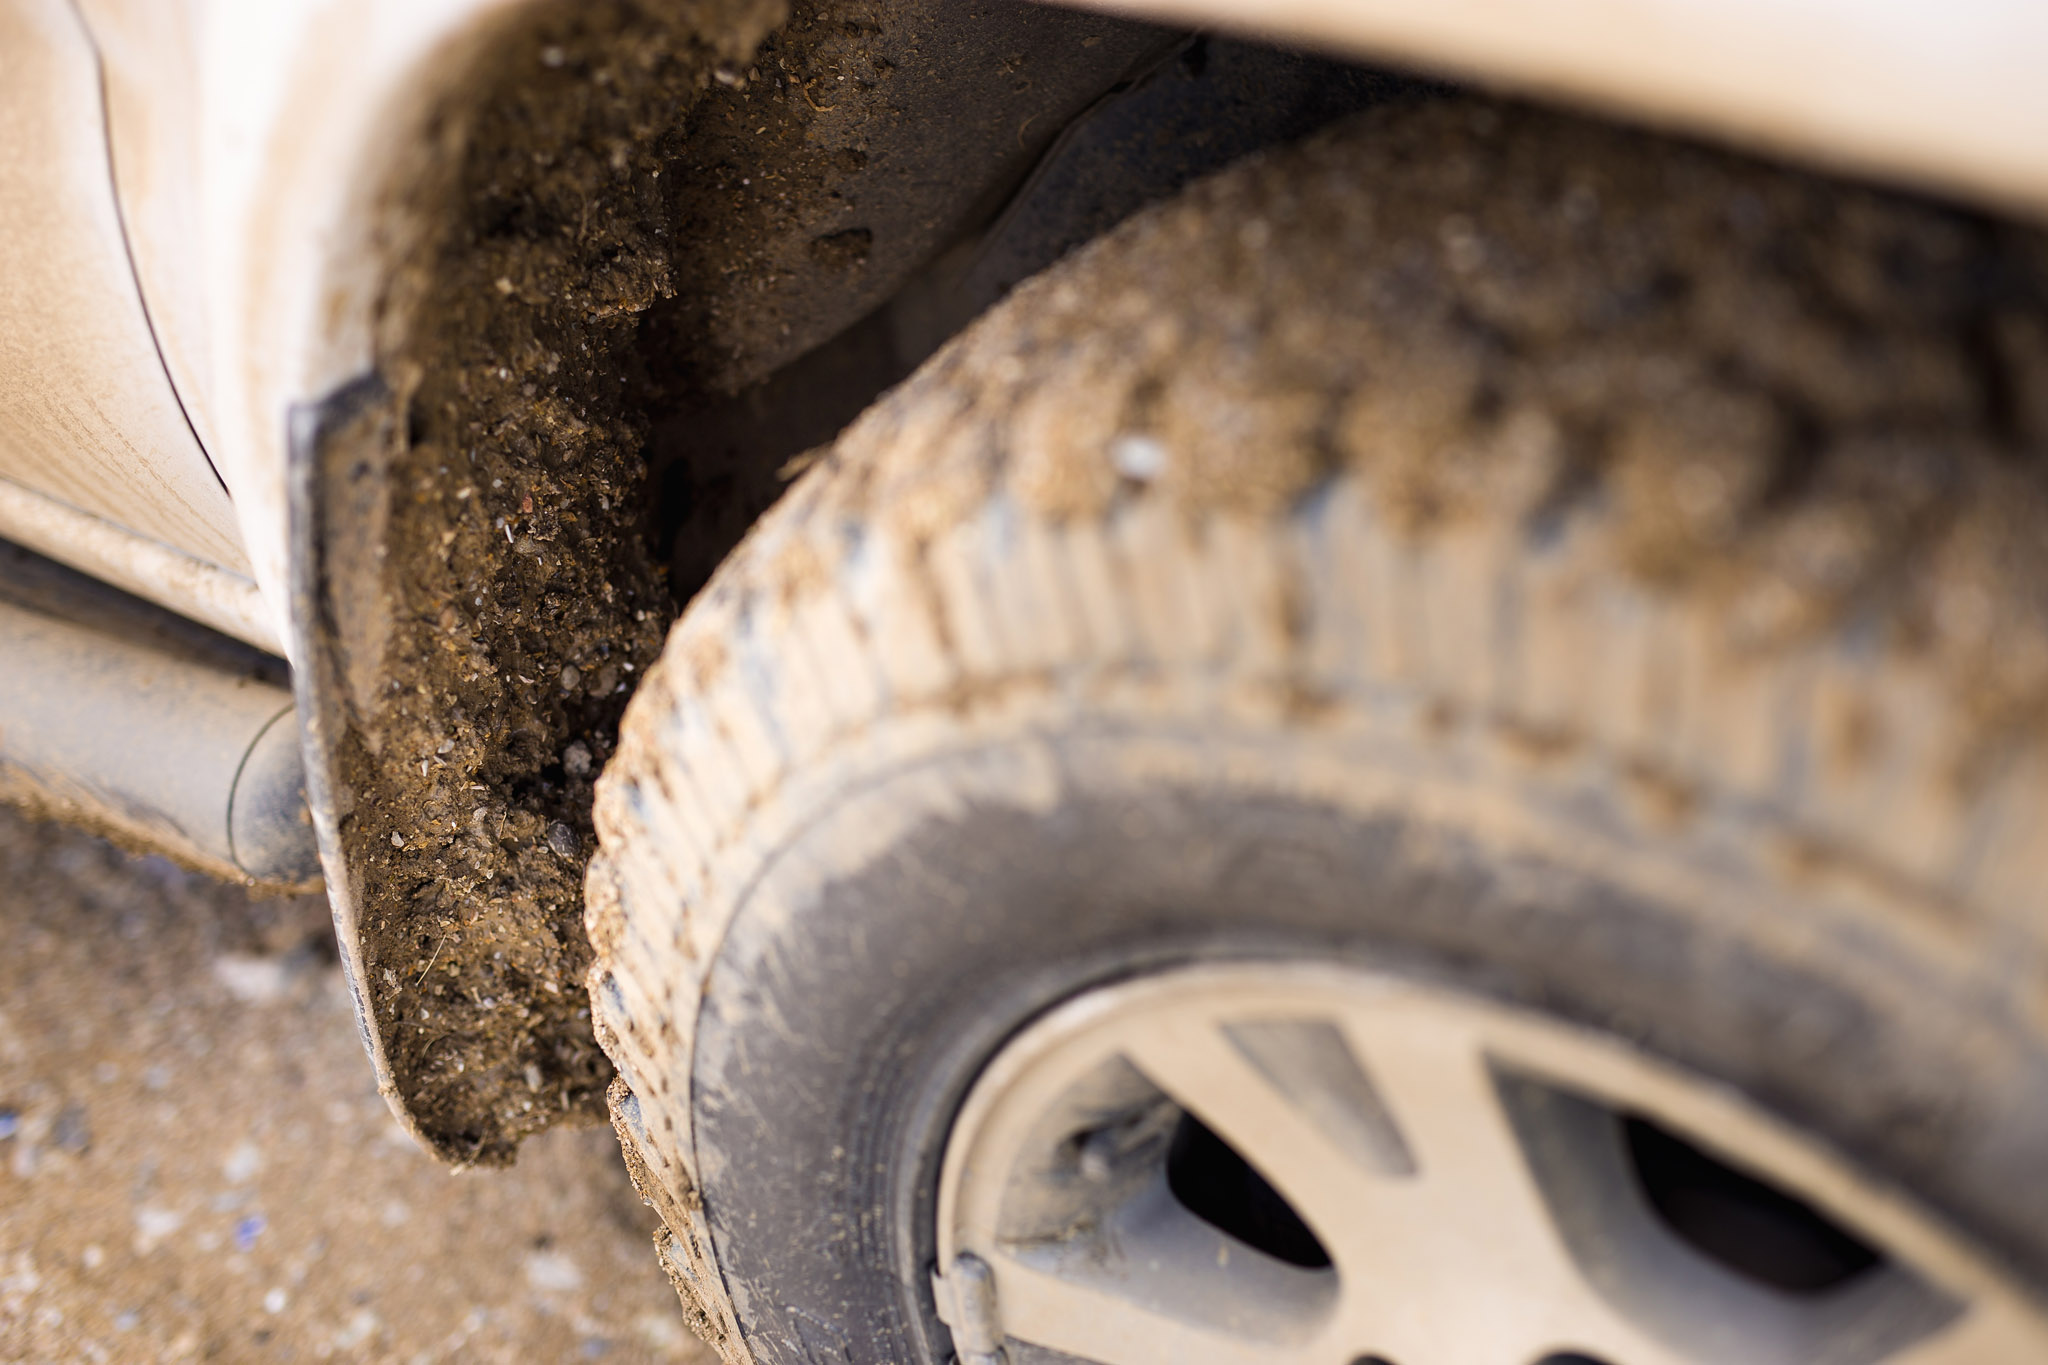 wedding-travellers-argentina-coast-car-dirt-sand-everywhere